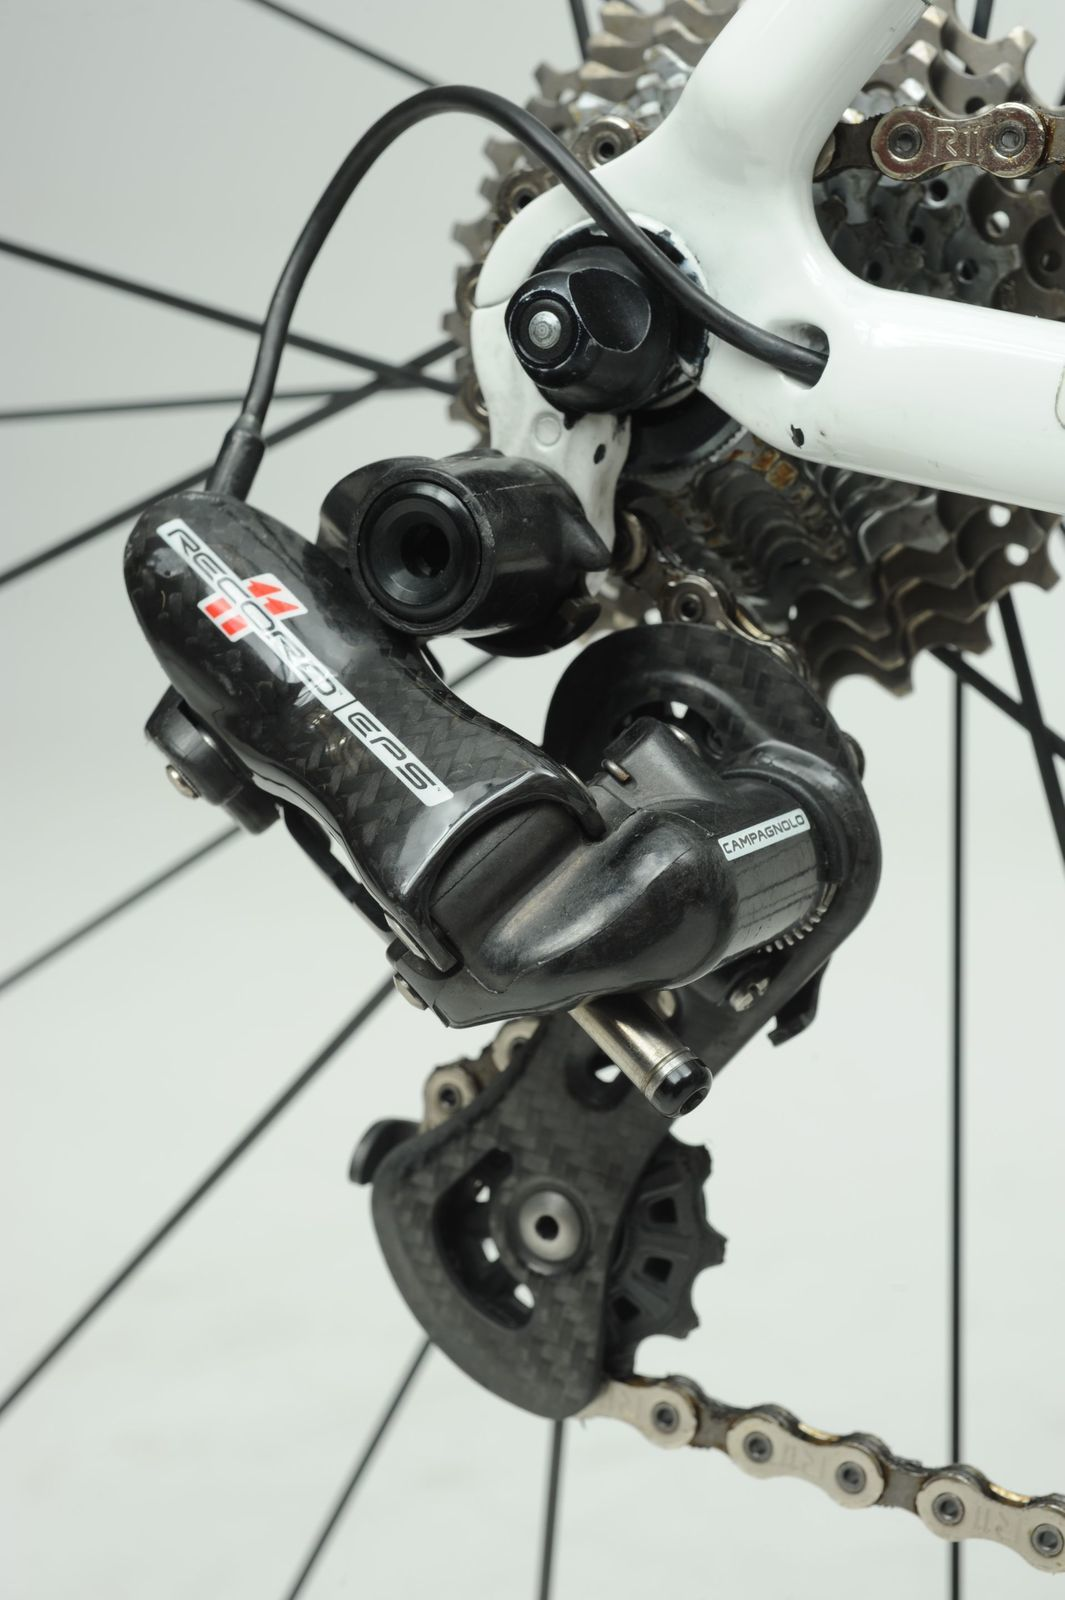 Vélo COLNAGO M10  &quot&#x3B;100ème Edition&quot&#x3B; TDF 2013.